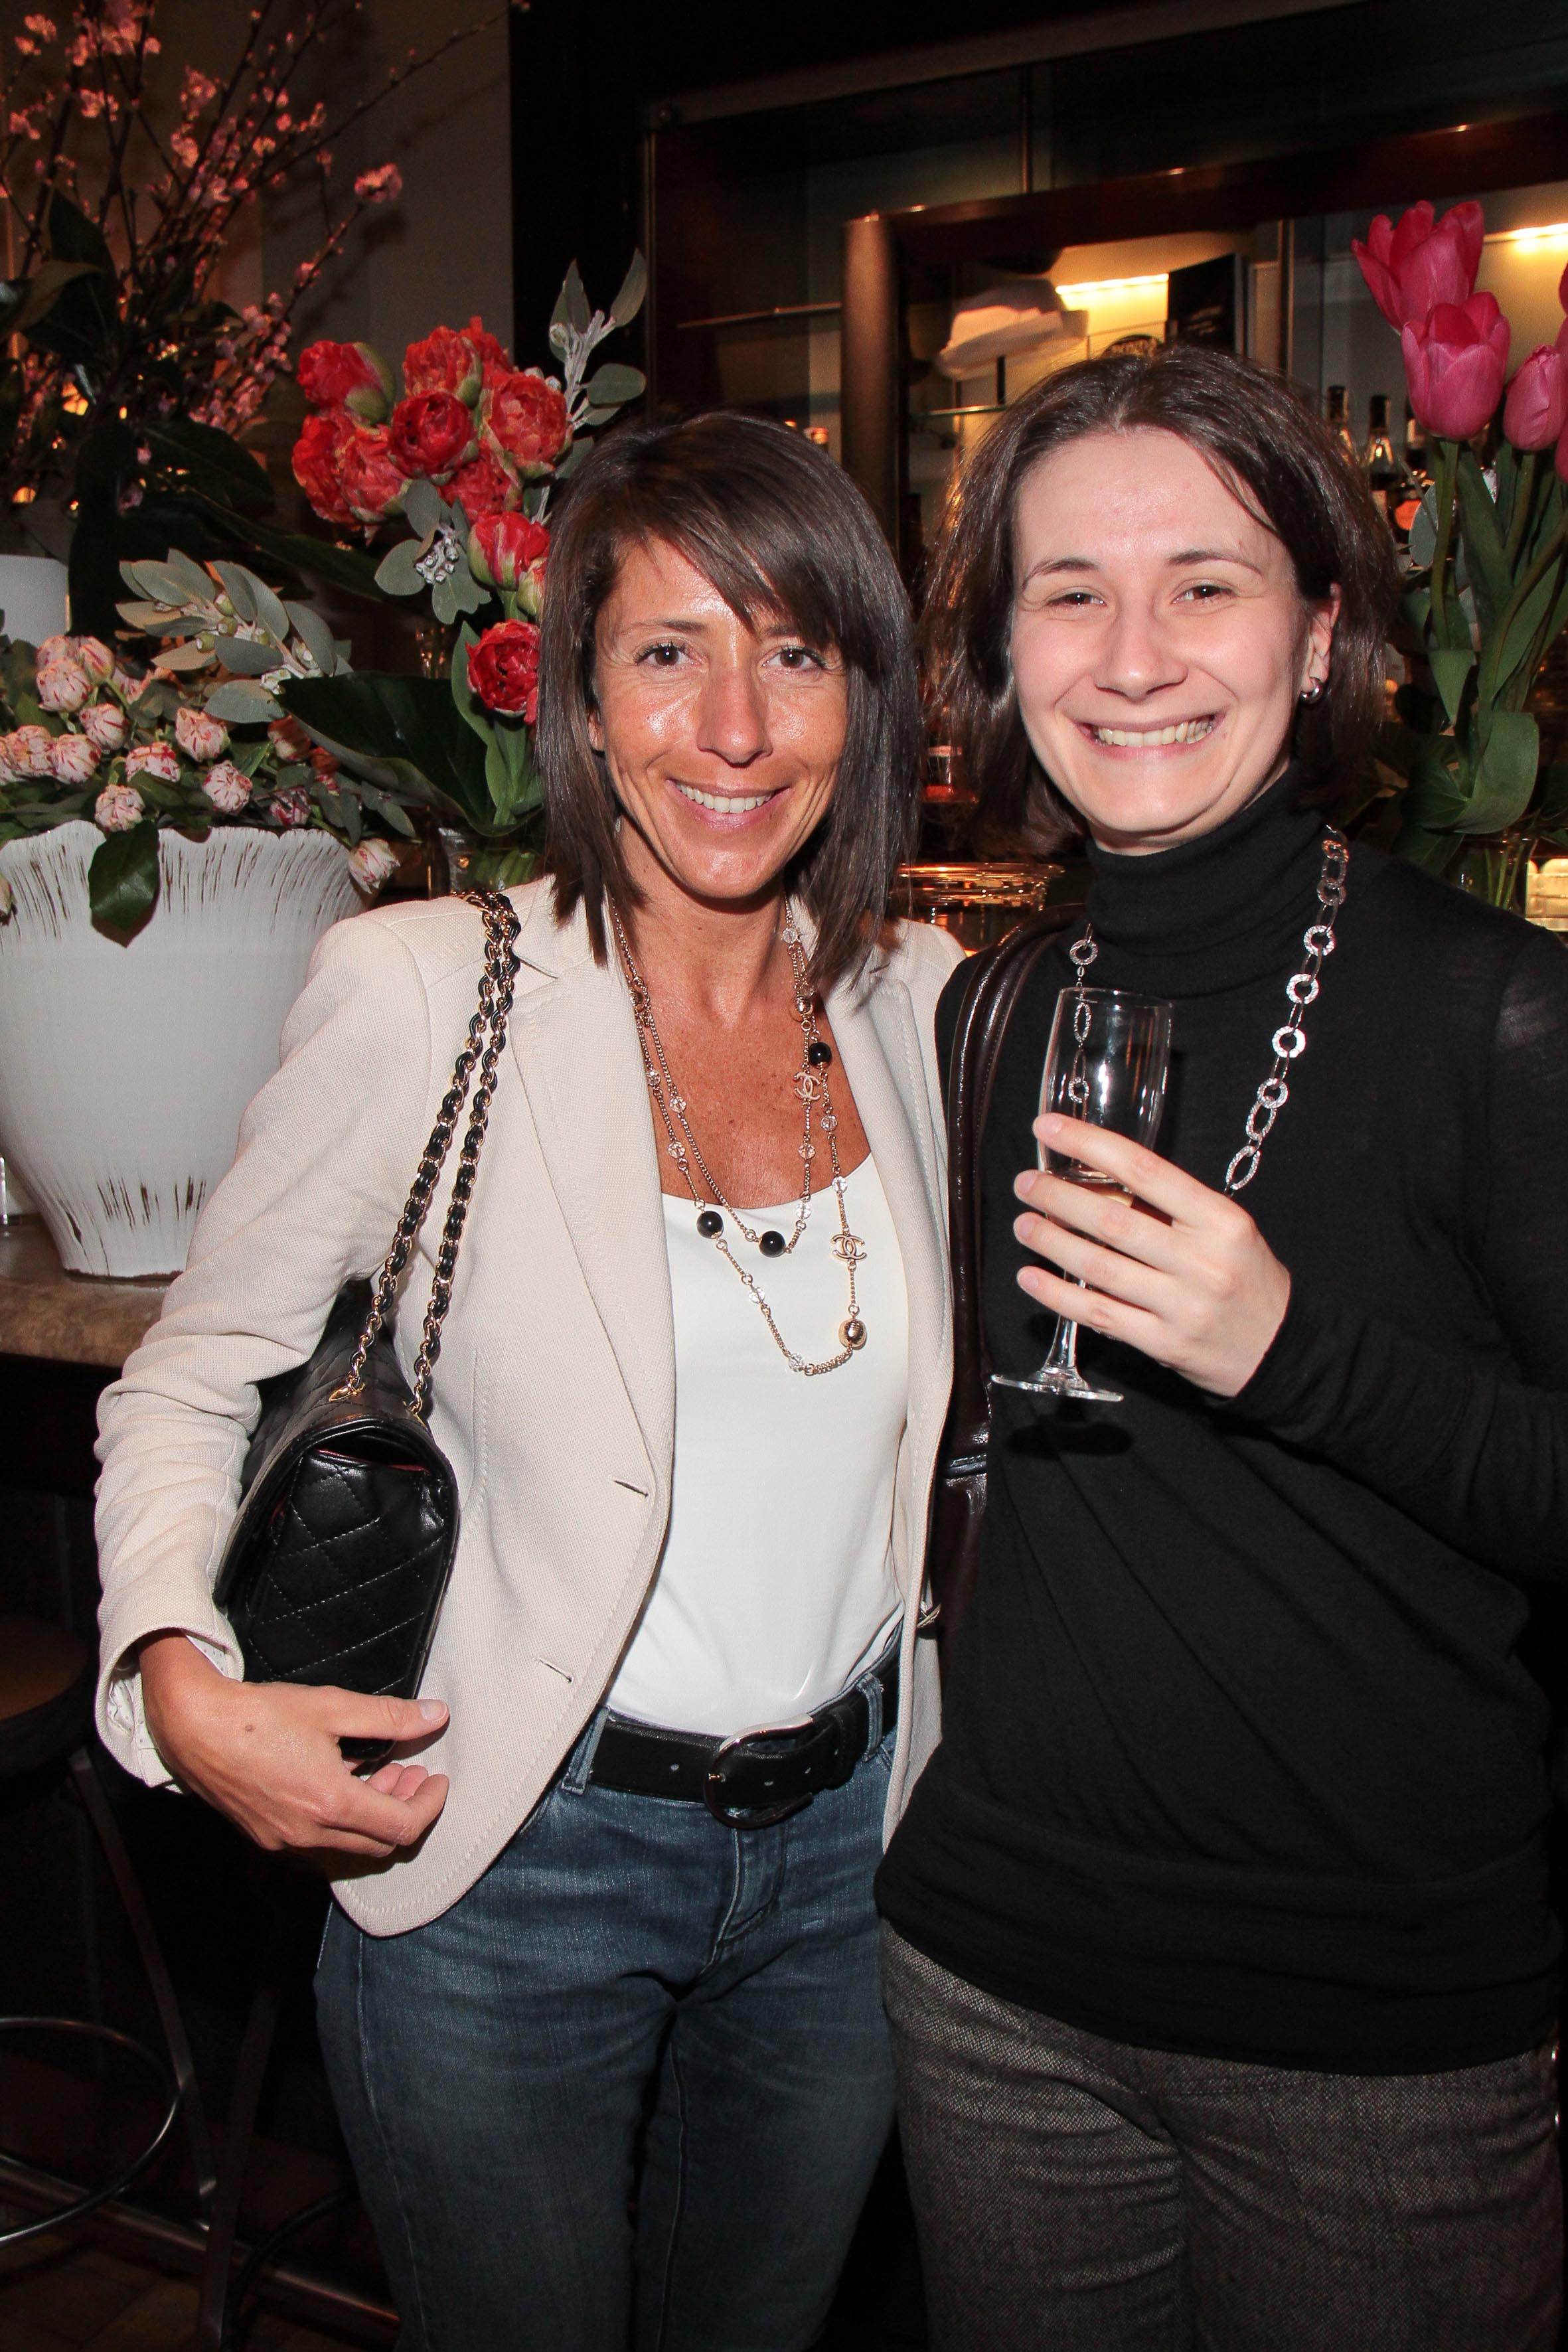 PRESSPHOTO Firenze, Hotel Savoy, inaugurazione Flower Shop Sebastian. Nella foto Mirijam Haim e Anje Geller Giuseppe Cabras/New Press Photo